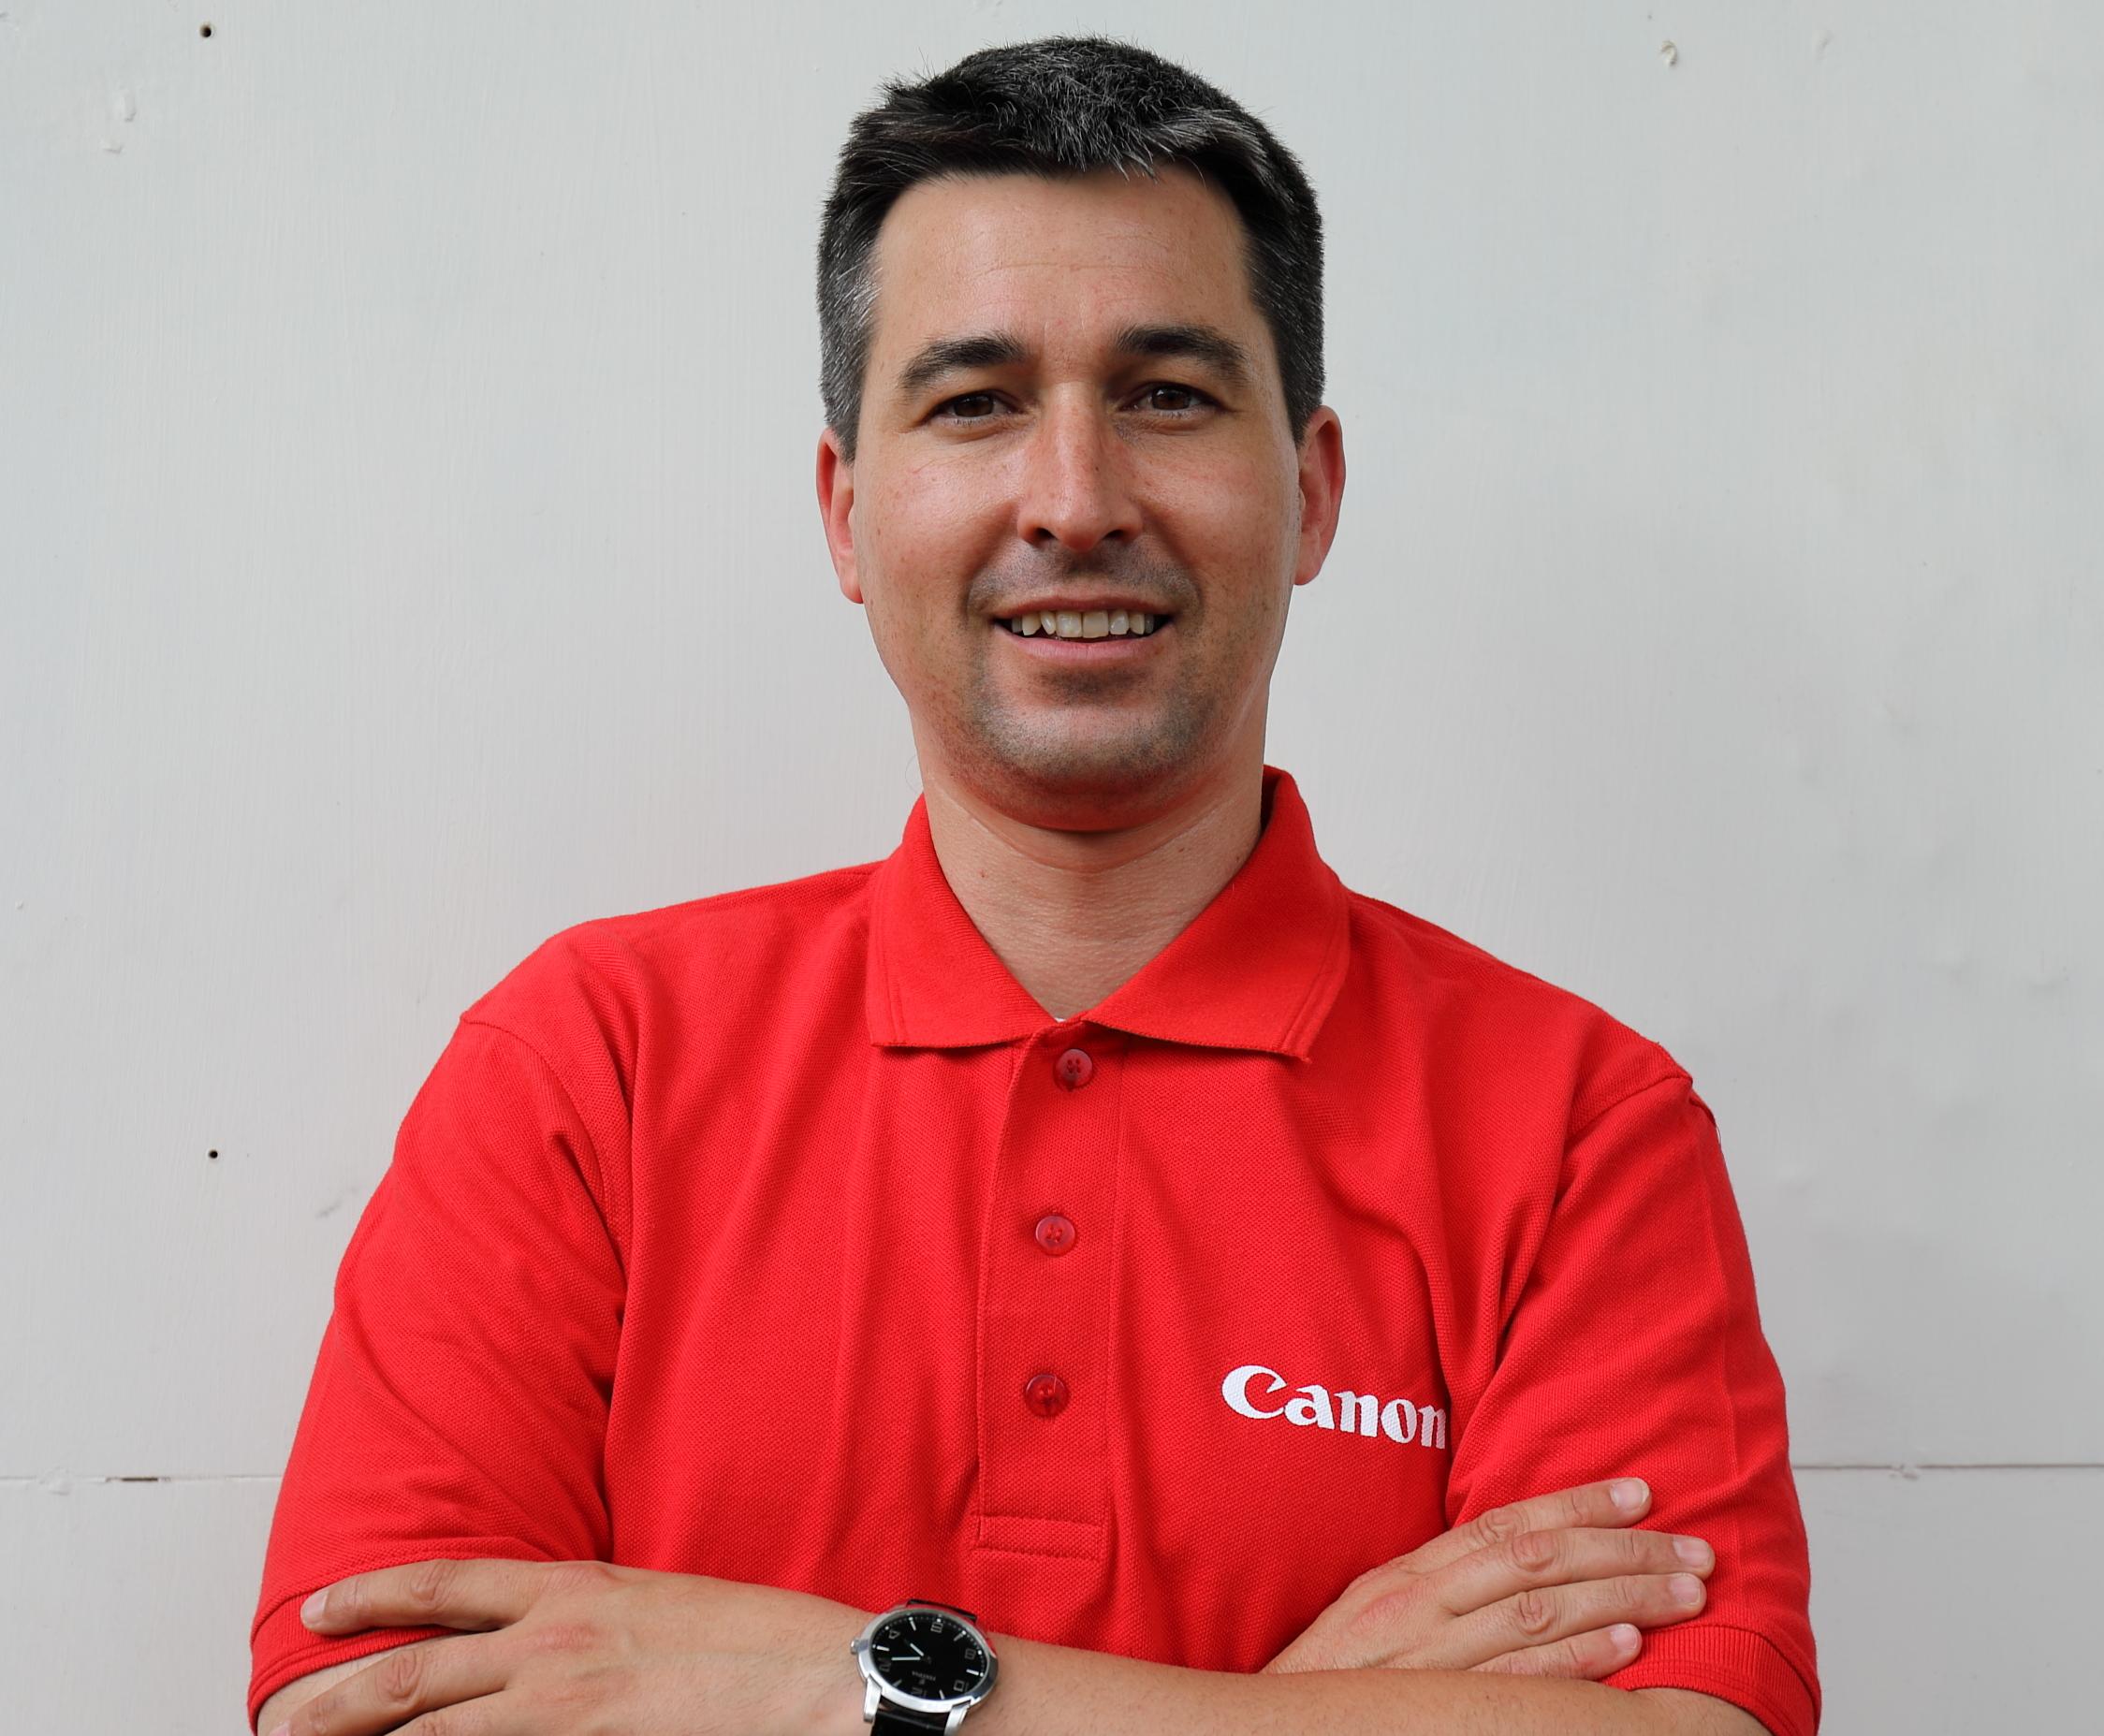 CANON – Jean Mazel – Kenya – Morocco a strong equation